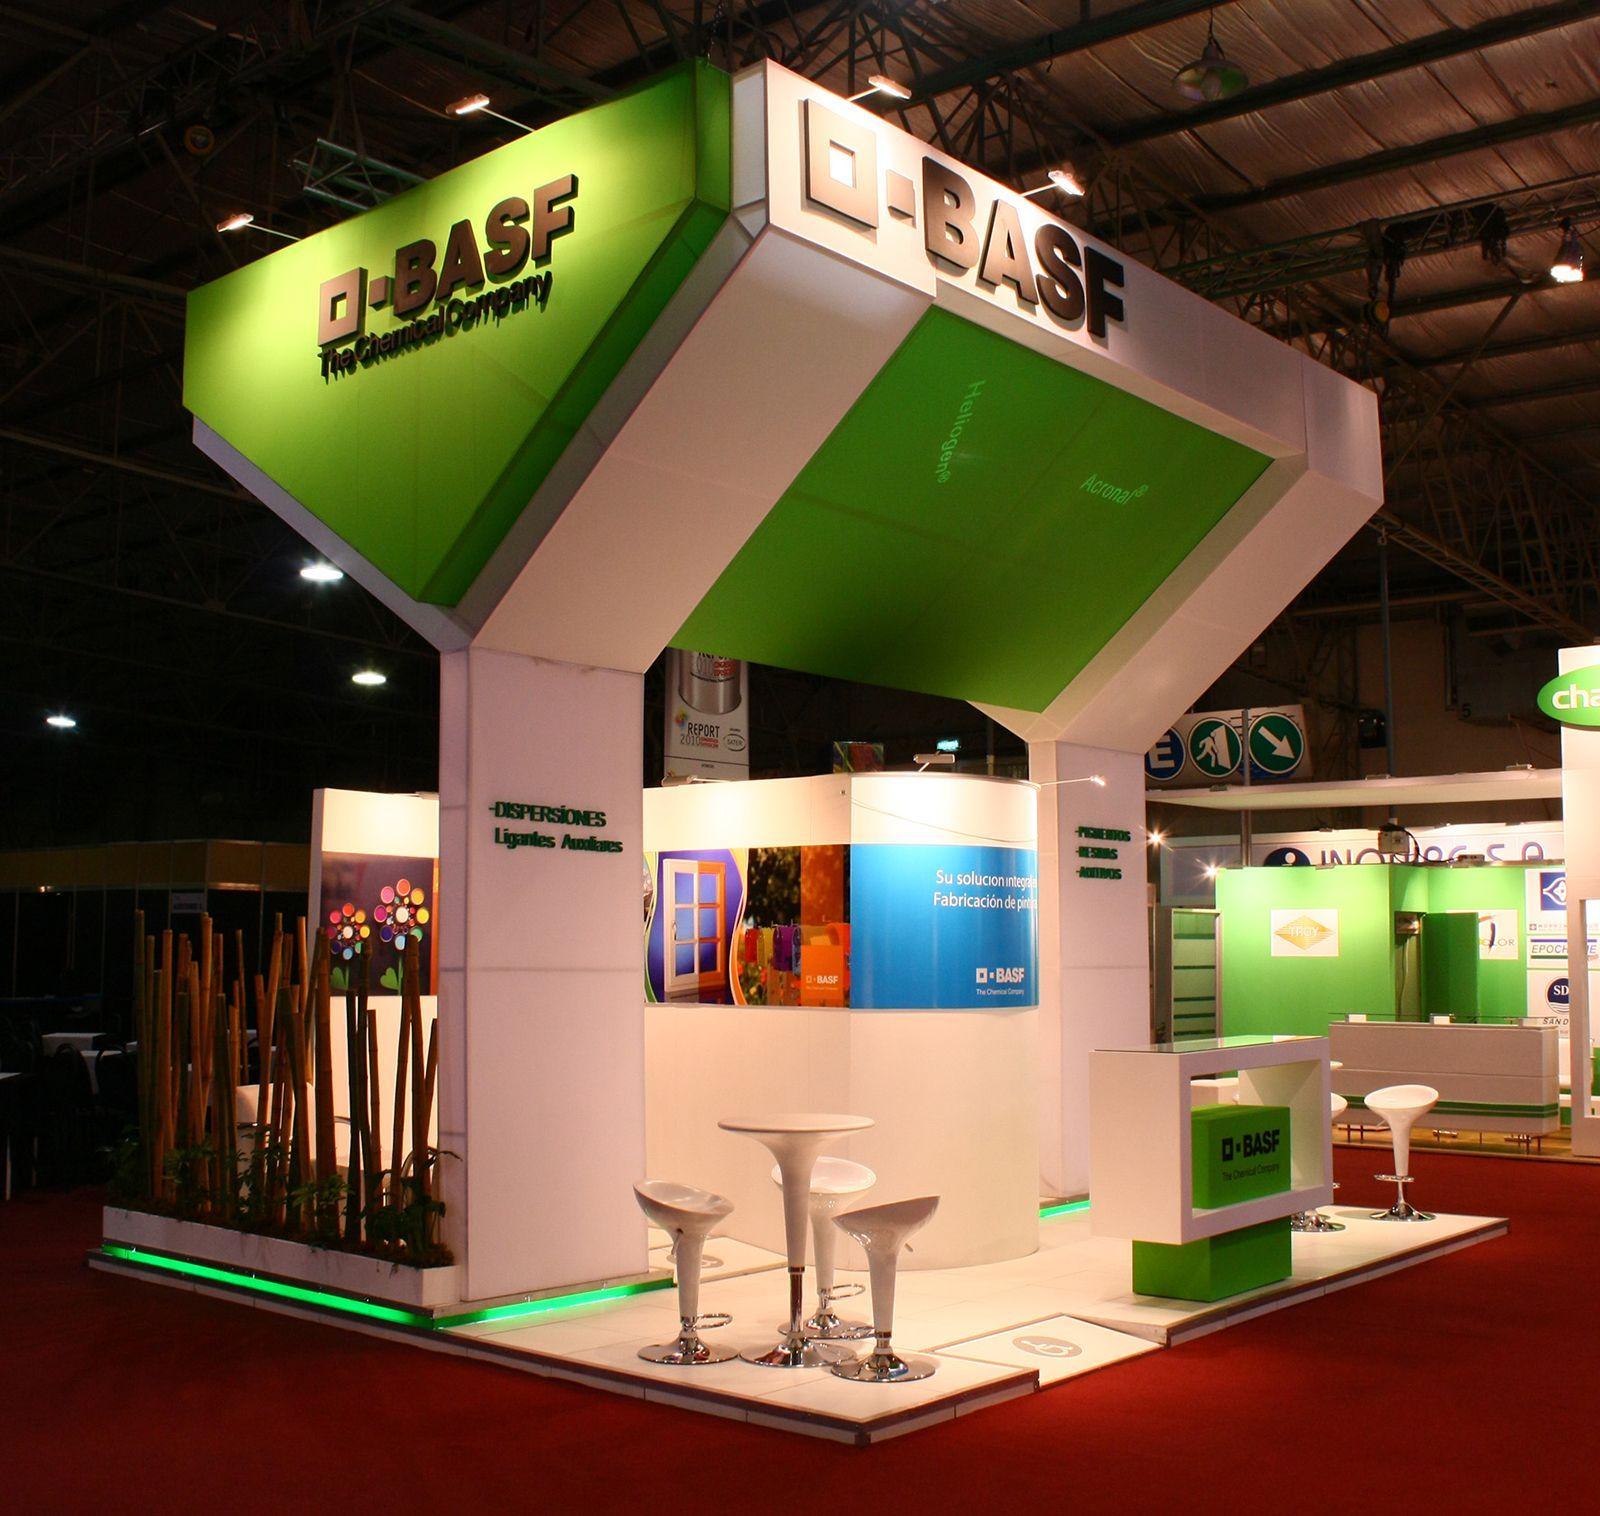 D Exhibition Booth Design : Cuatro d fair stand exhibition booth booth design stand design